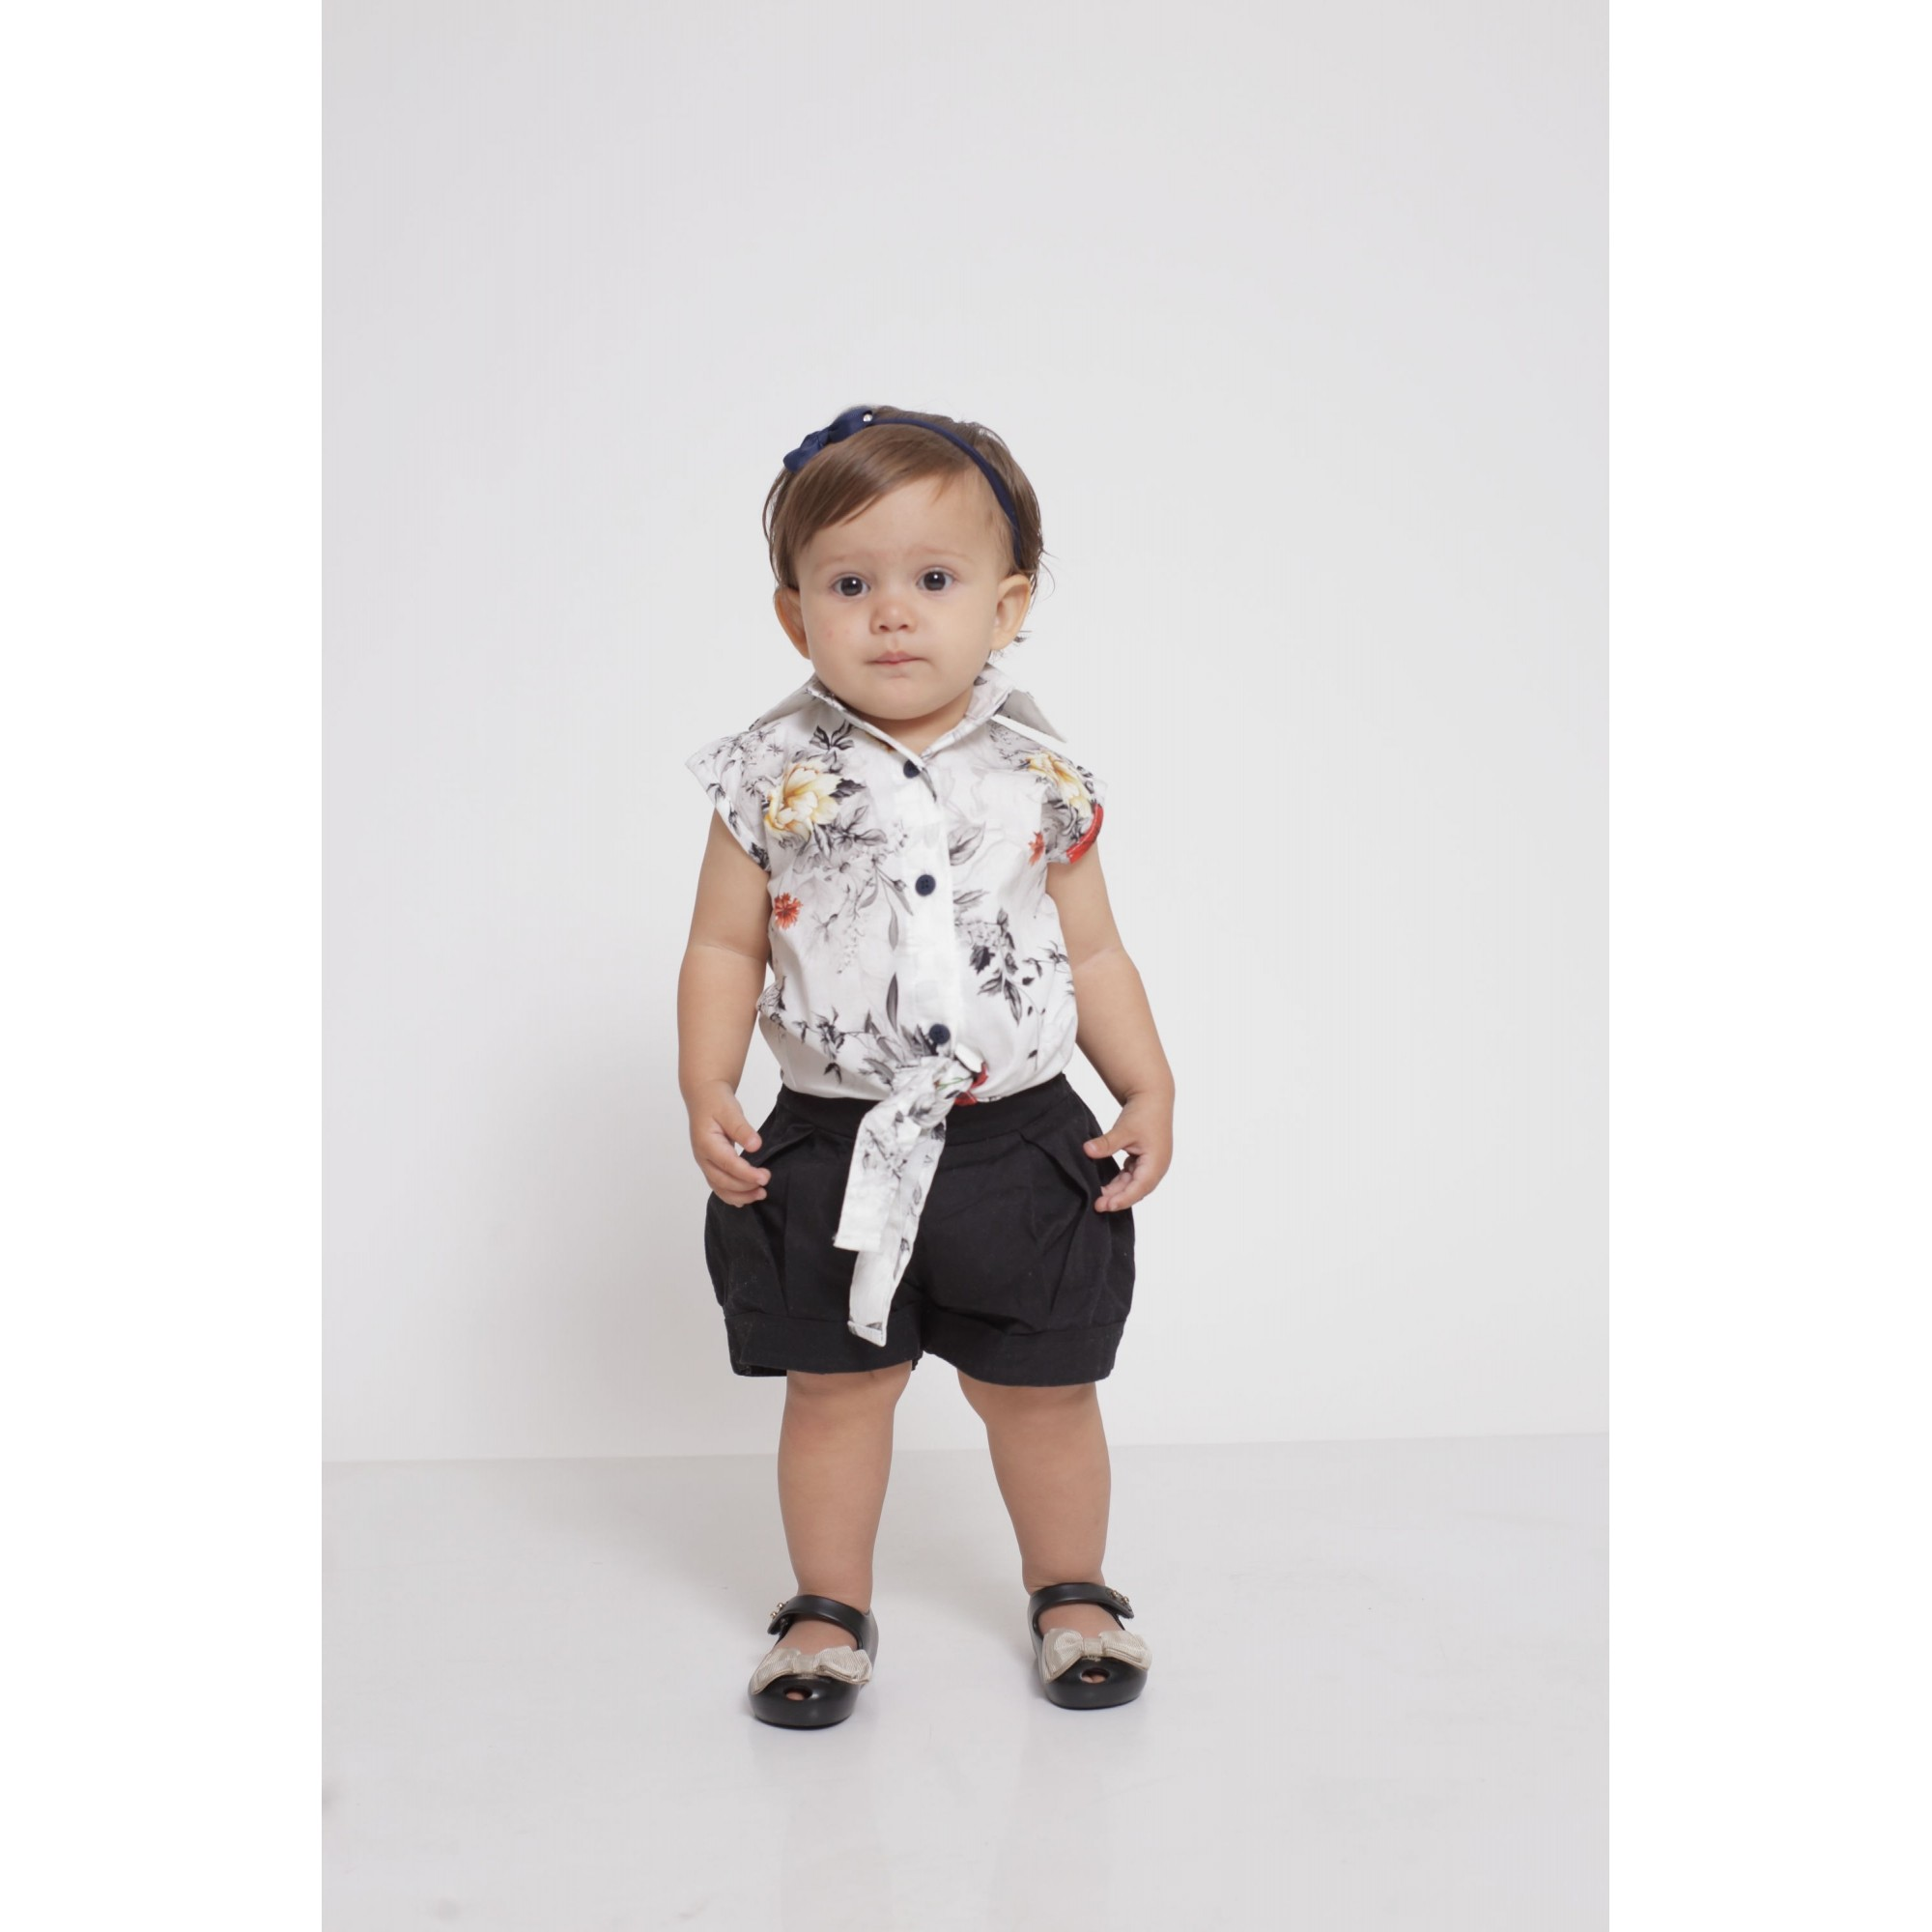 Camisa Social Sem Manga Branca Floral Feminina Infantil